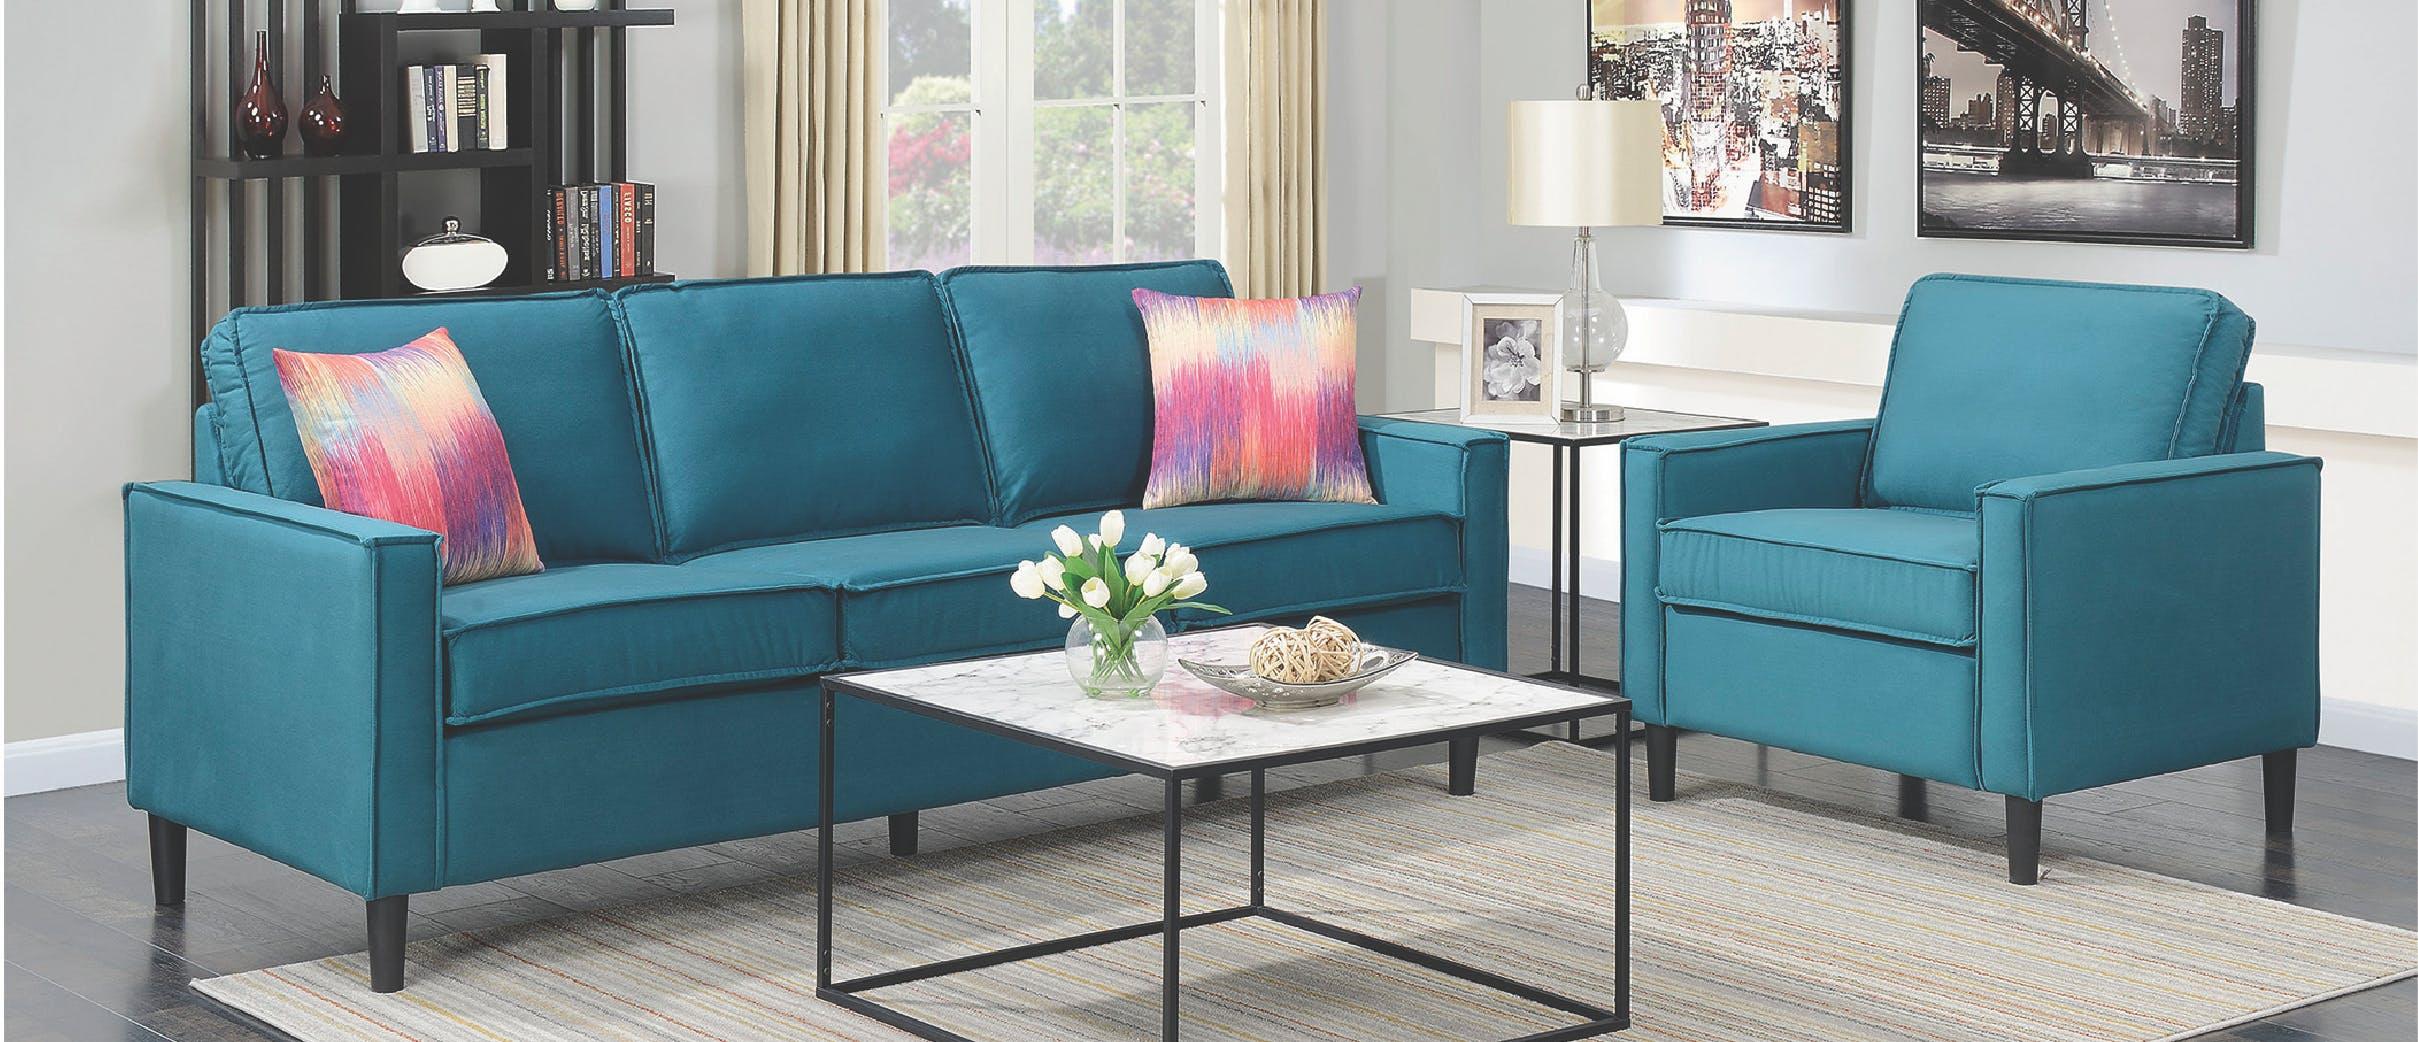 elements+furniture.jpg